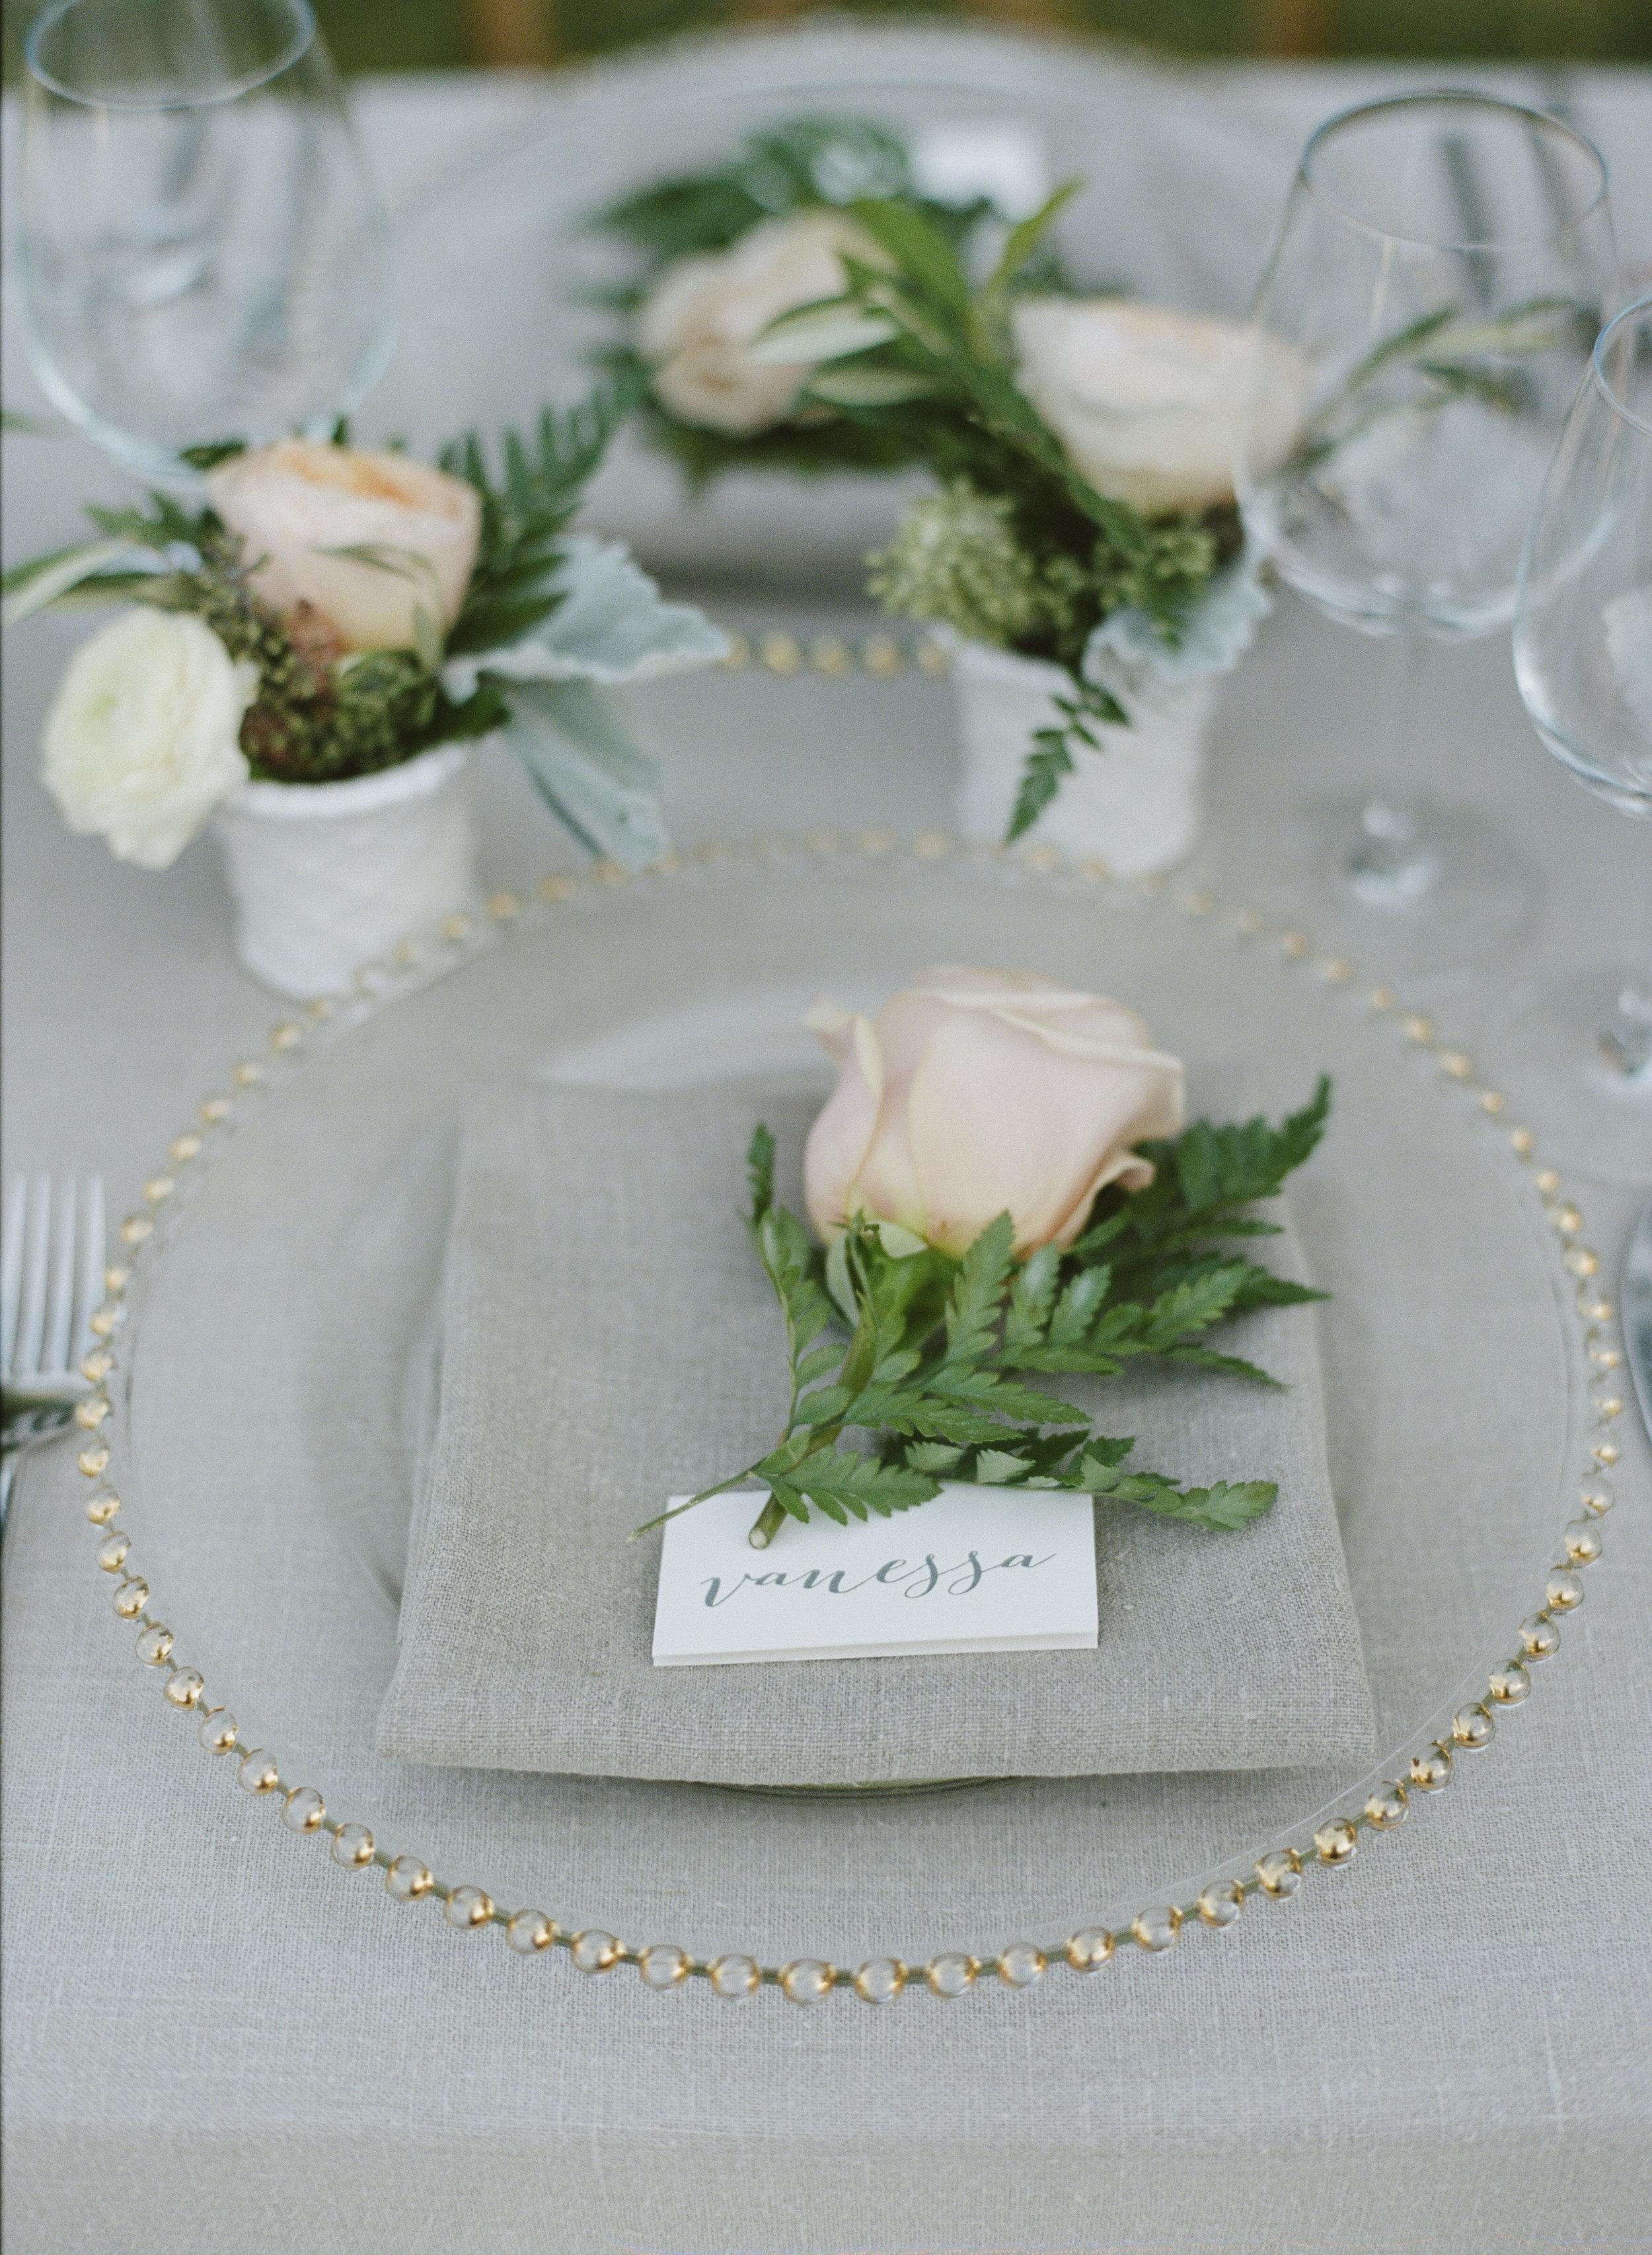 Violette-fleurs-roseville-sacramento-california-Flower-farm-inn-wedding-florist-spring-tablescape-luxury-detail-photos.jpg